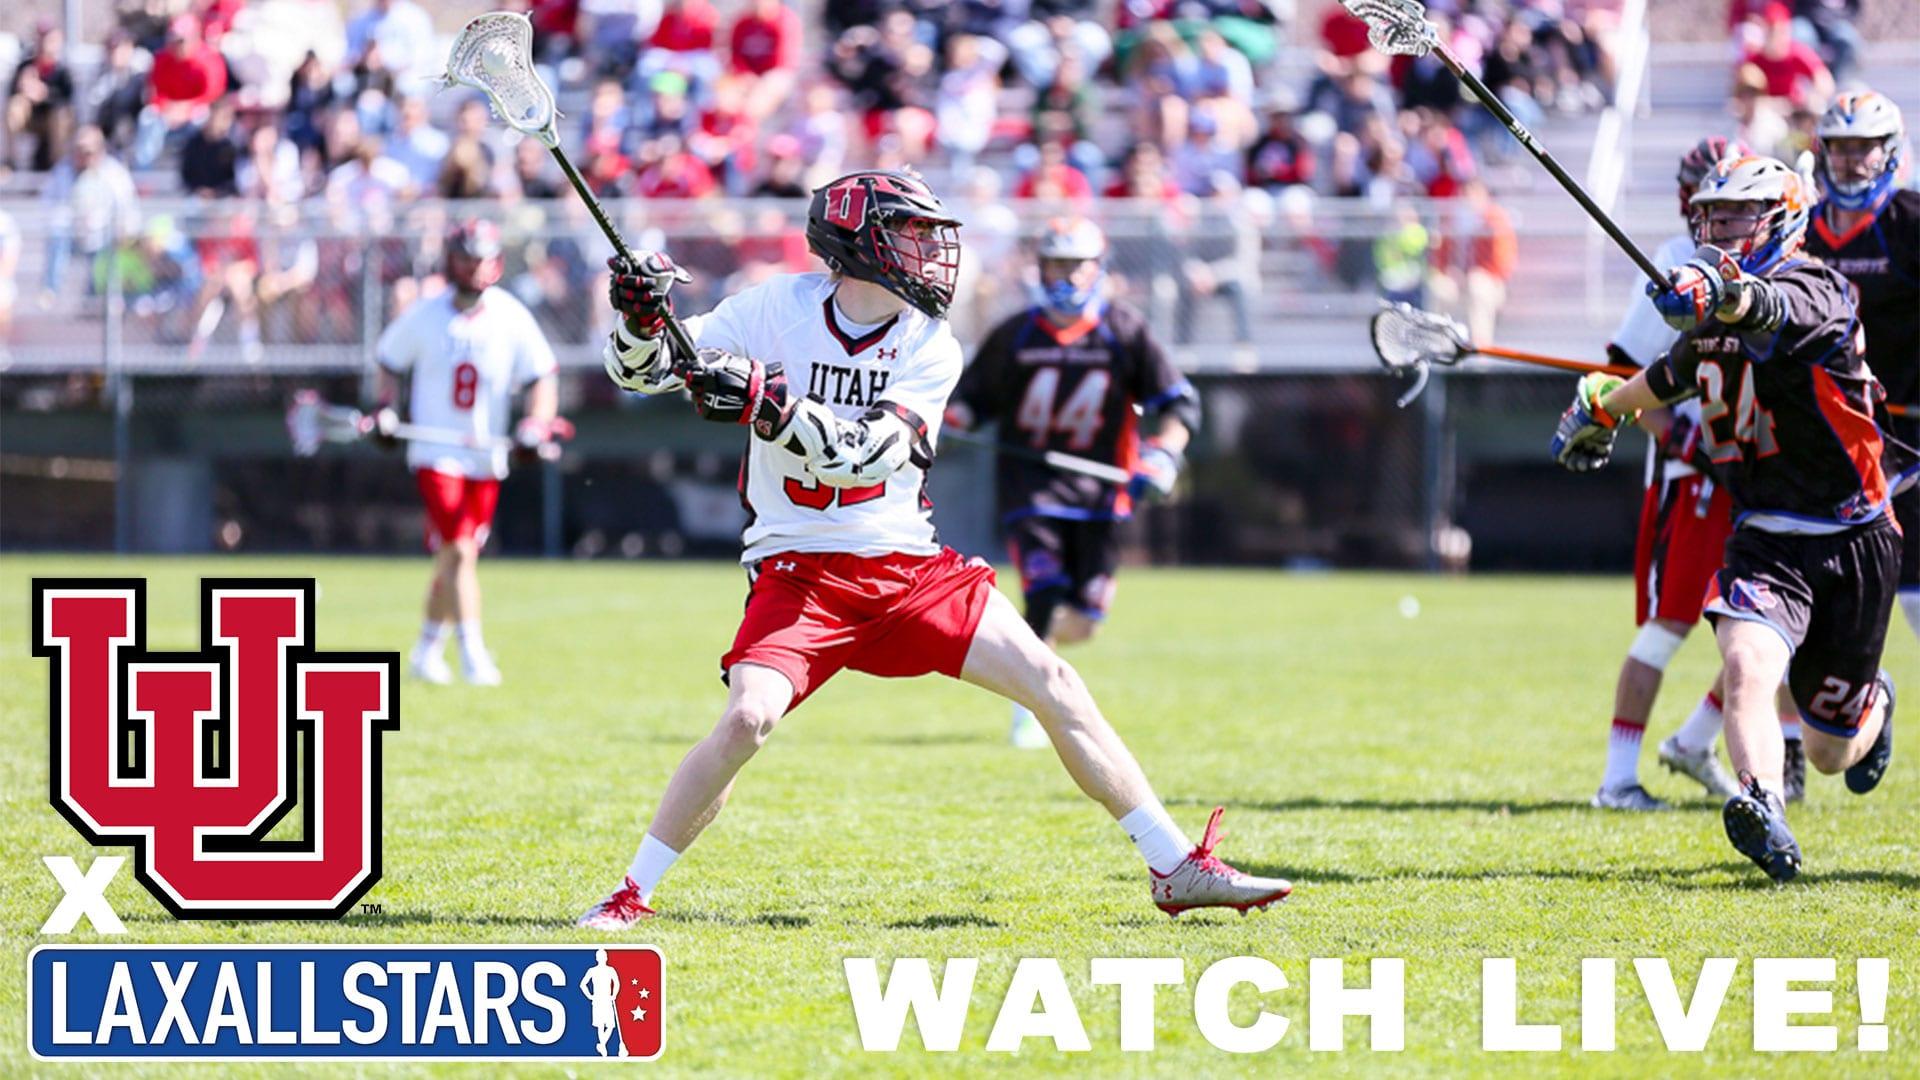 Utah Utes Men's lacrosse games on LaxAllStars